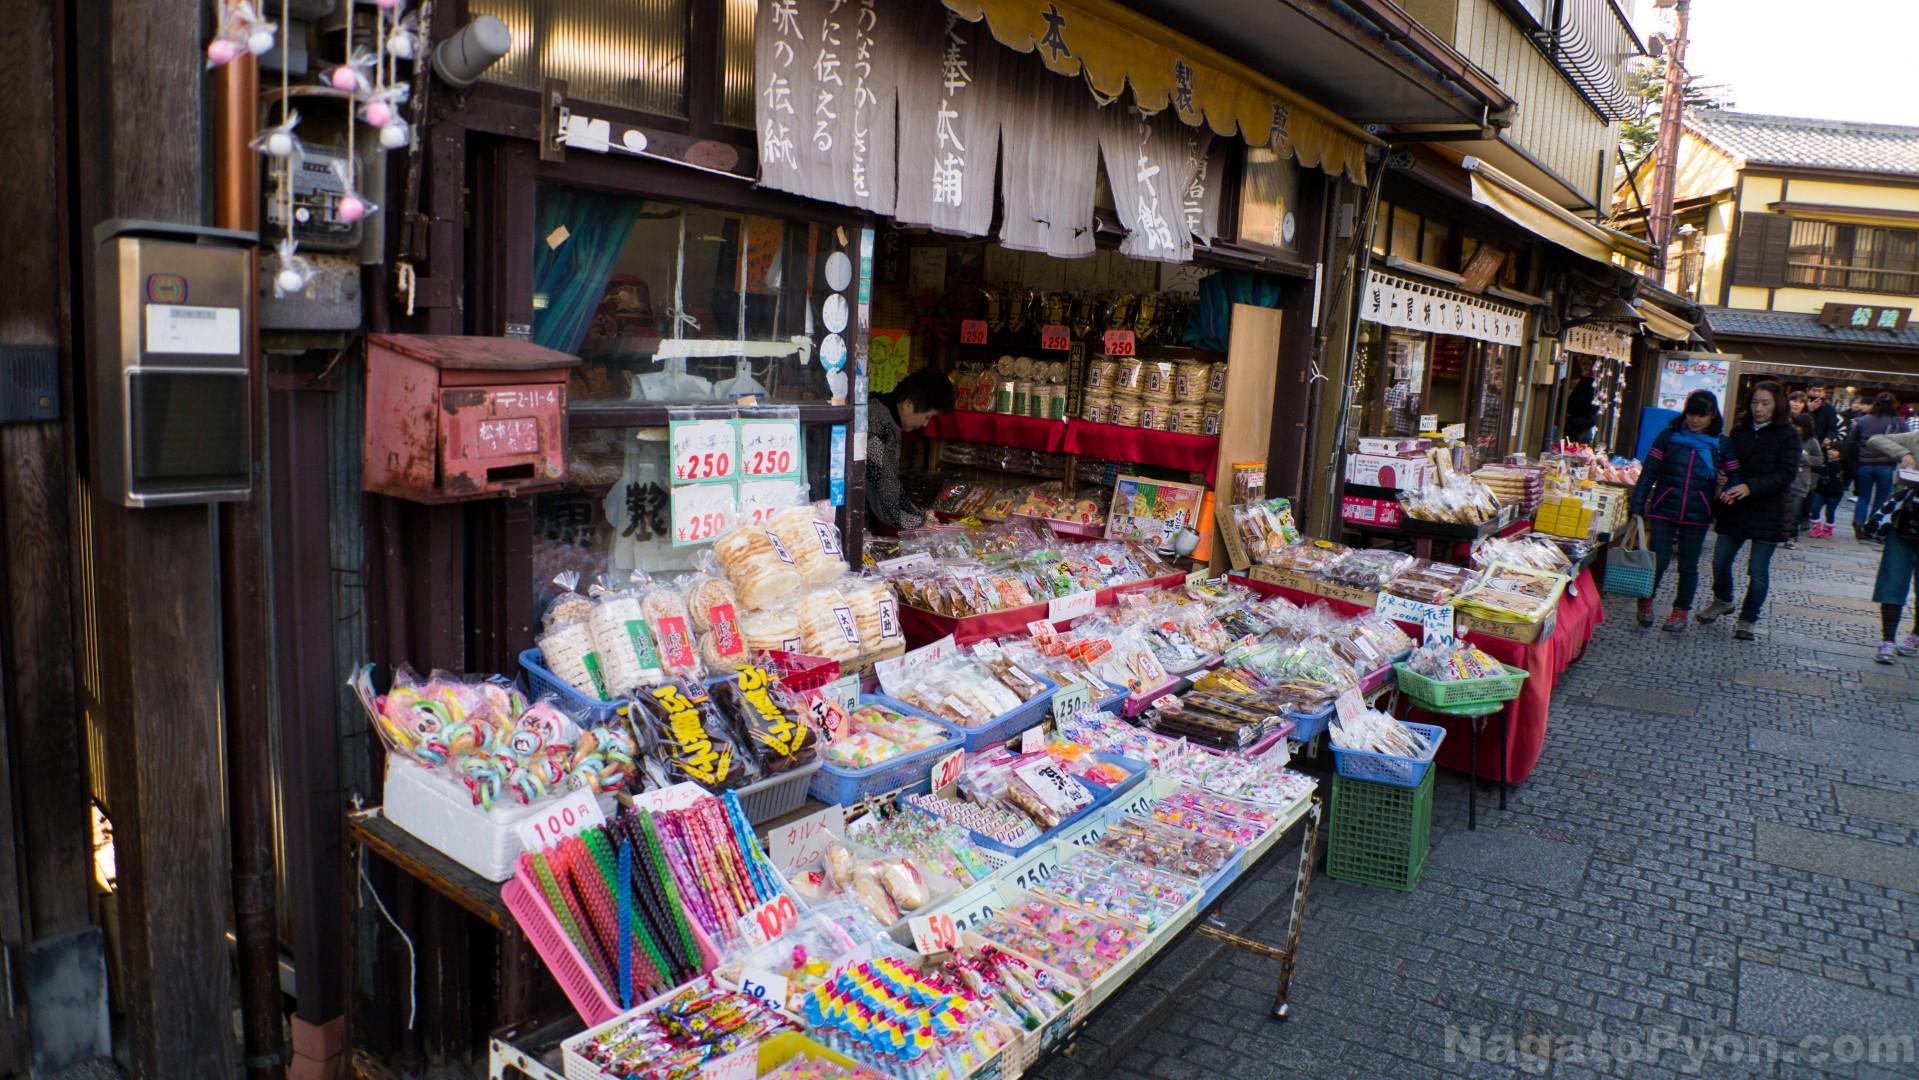 Kashiya Yokocho Alley